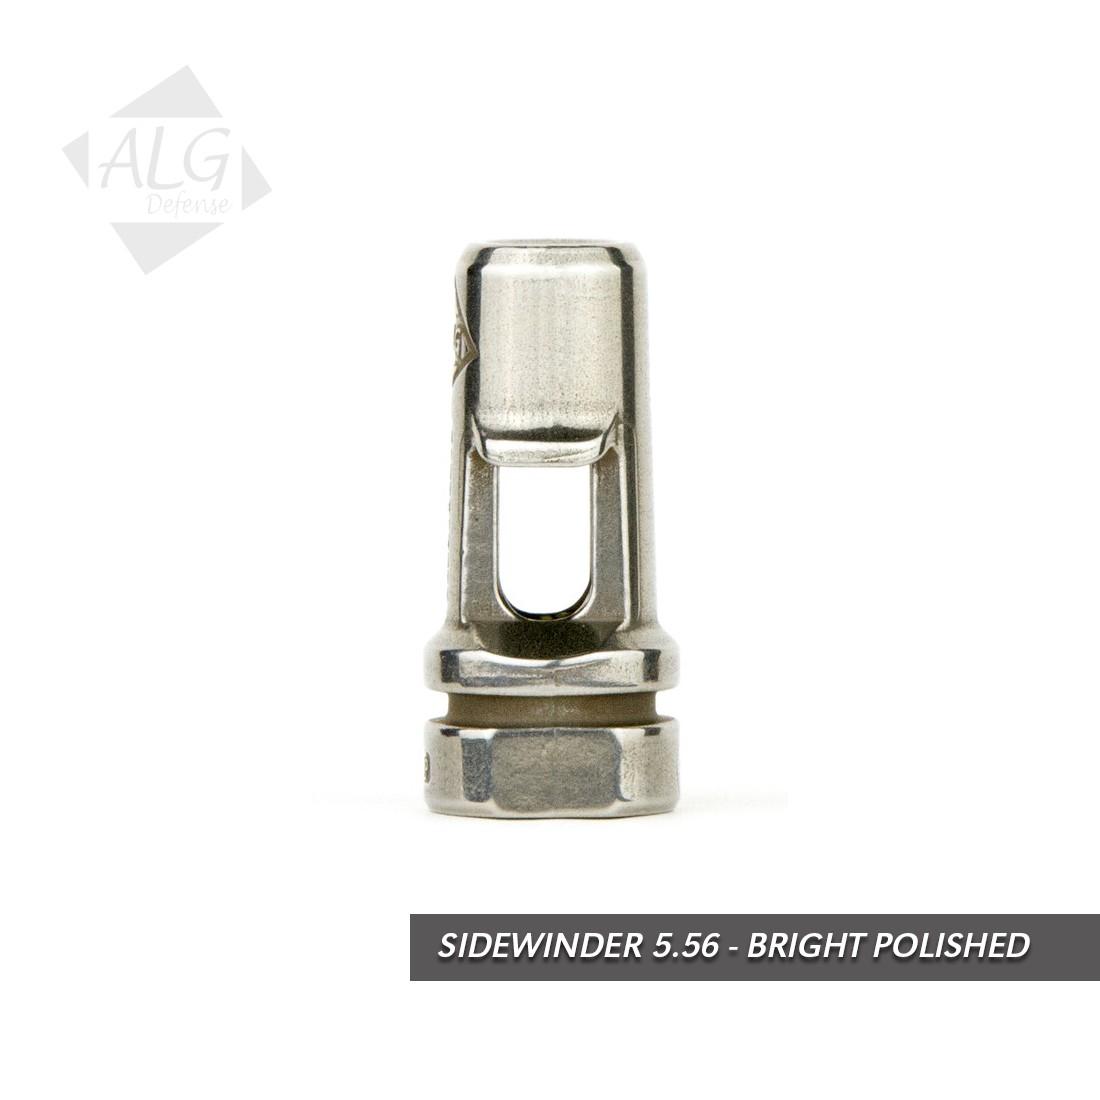 ALG Defense Sidewinder 5.56 Muzzle Brake